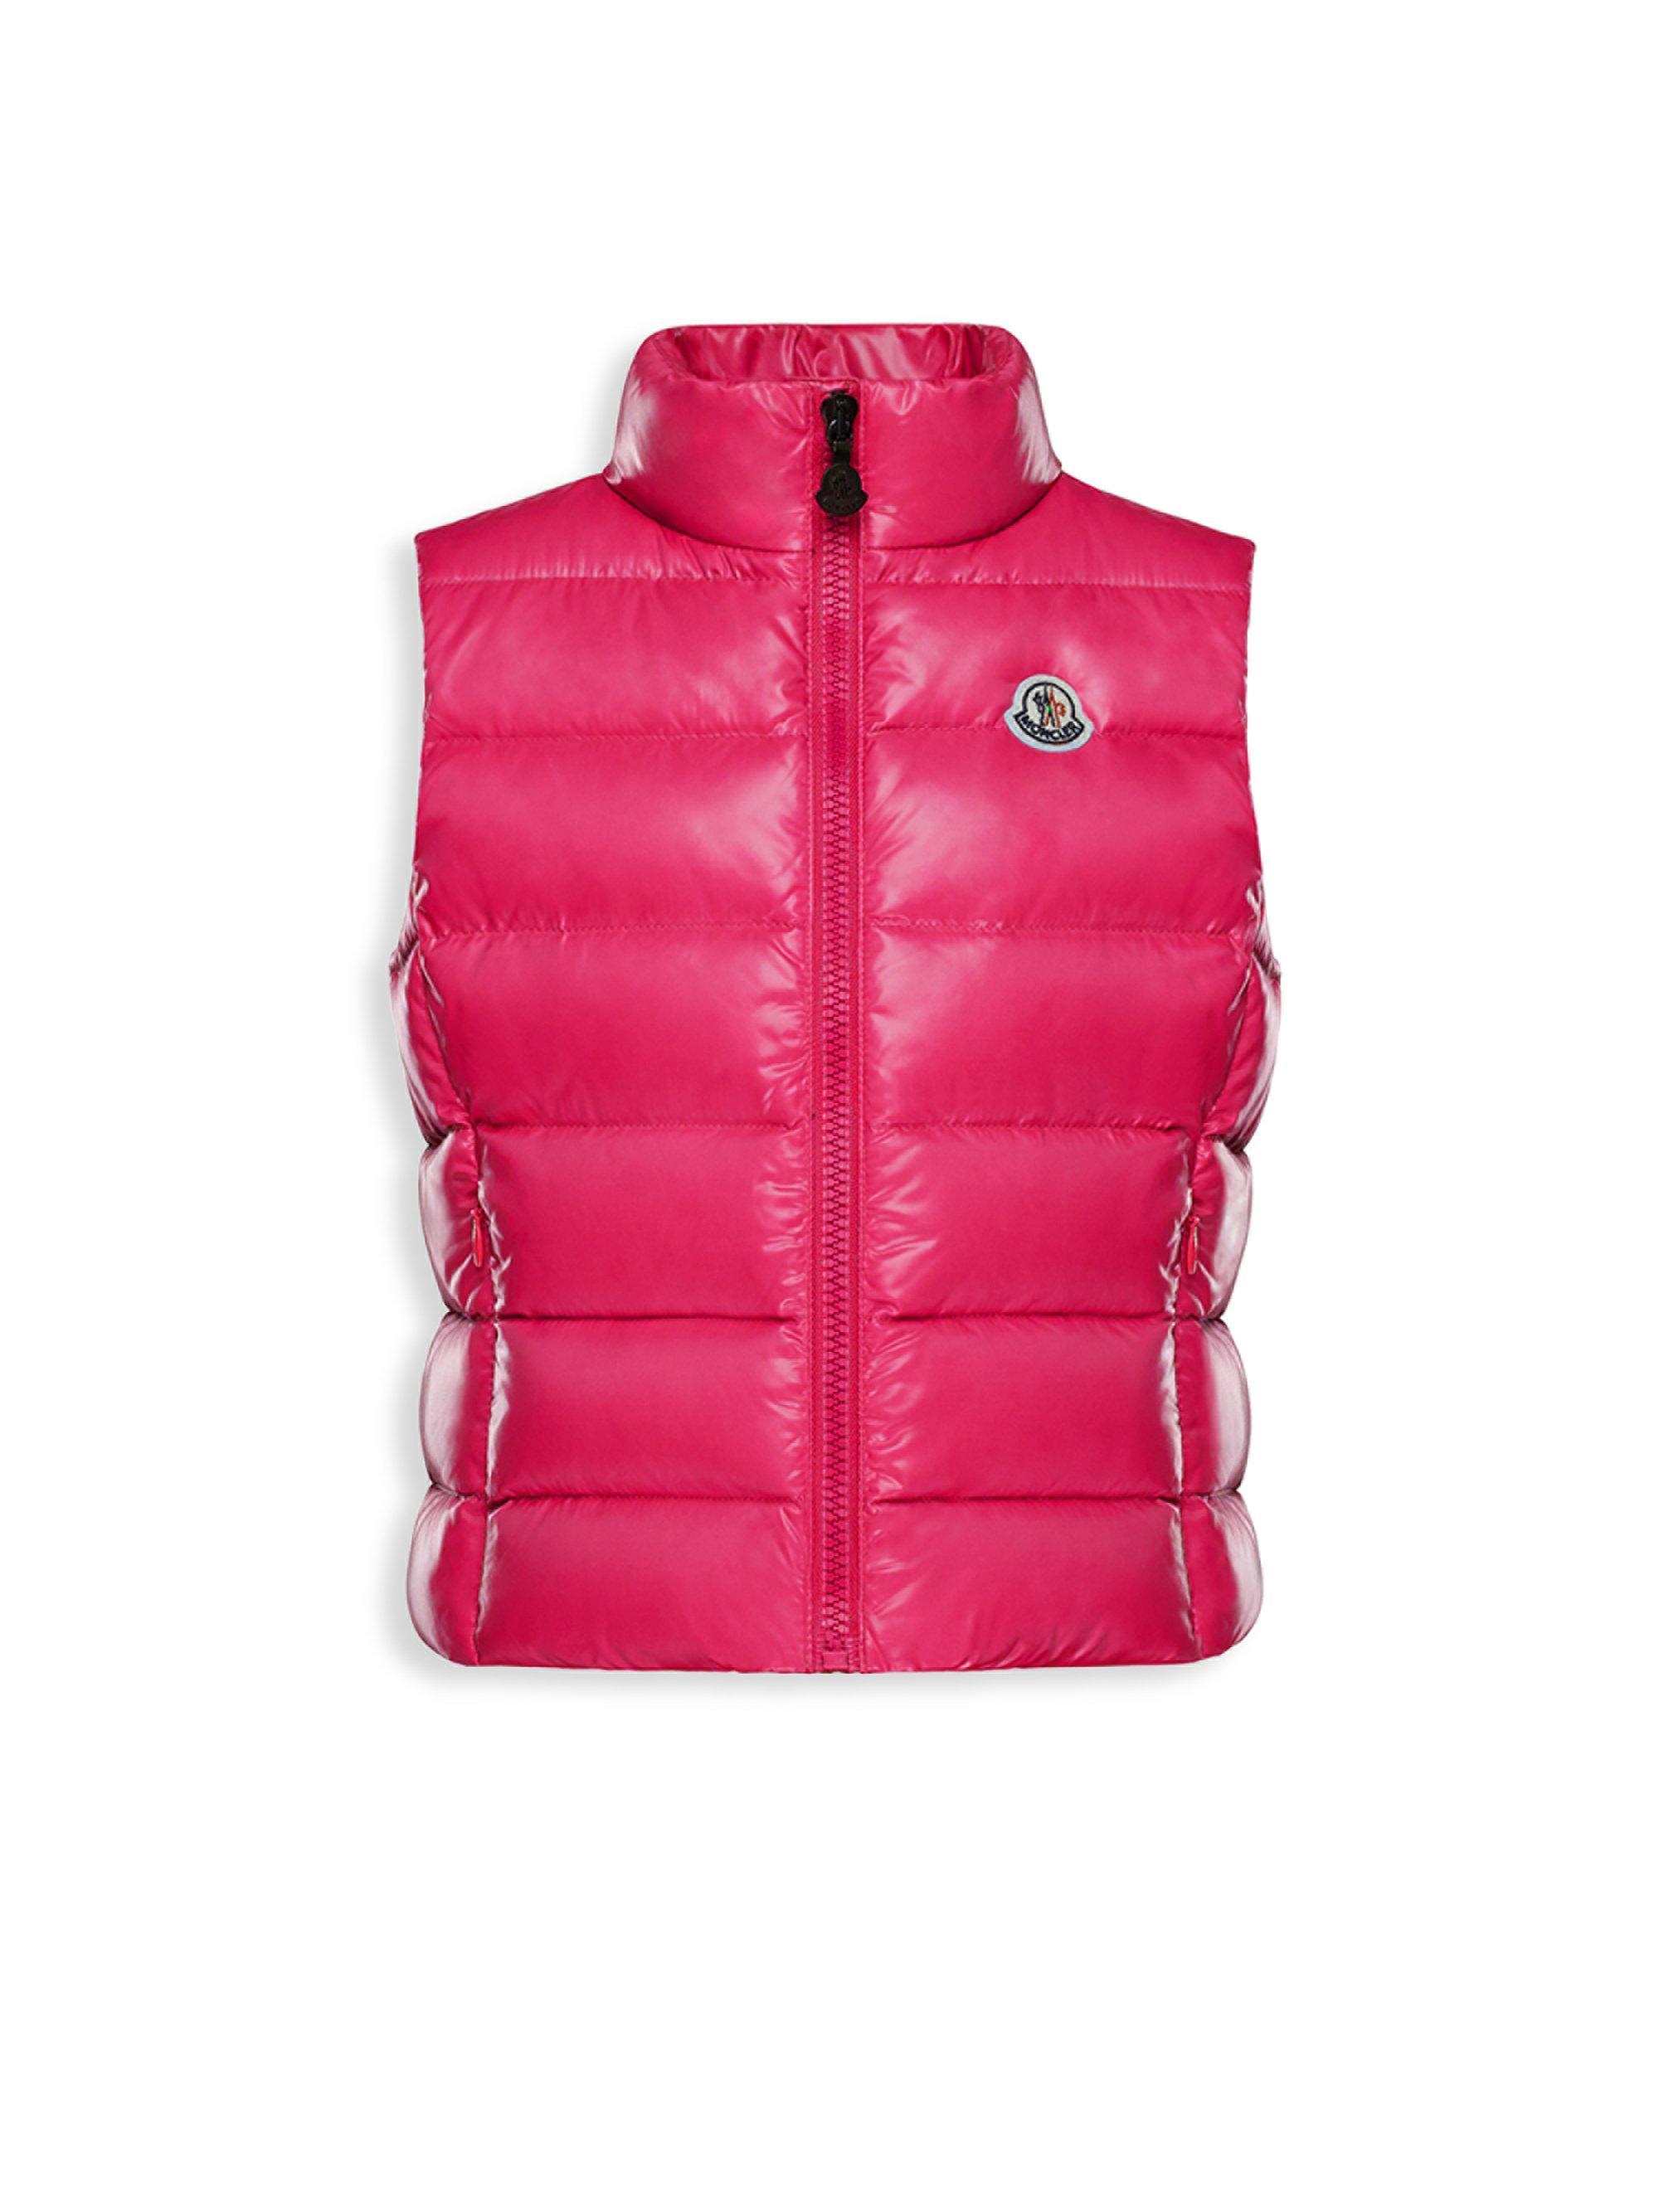 3521d18ebdb5 Moncler Girl s Ghany Vest in Pink - Lyst